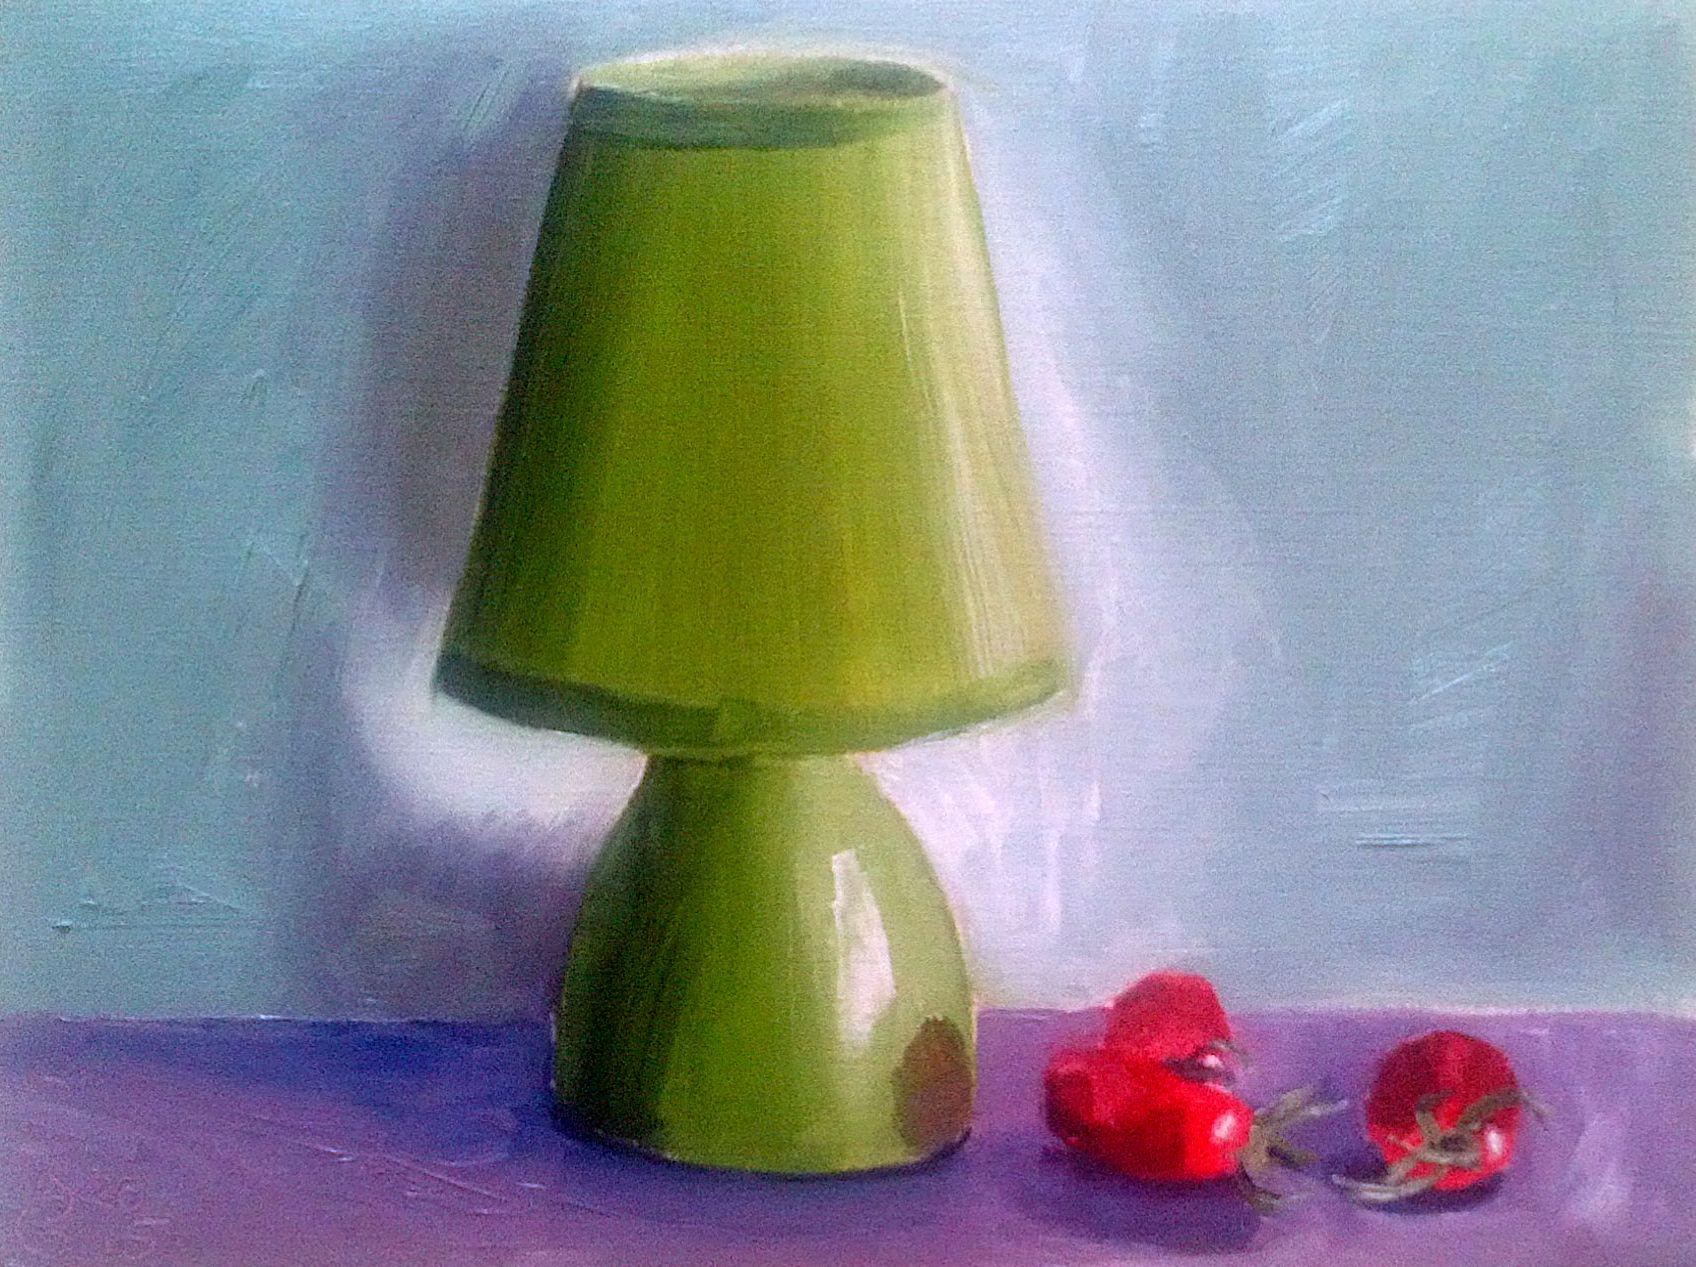 Grüne Lampe. Öl auf Papier, 18 x 24 cm. Green Lantern. Öil on paper, 7.0 x 9.4 in.